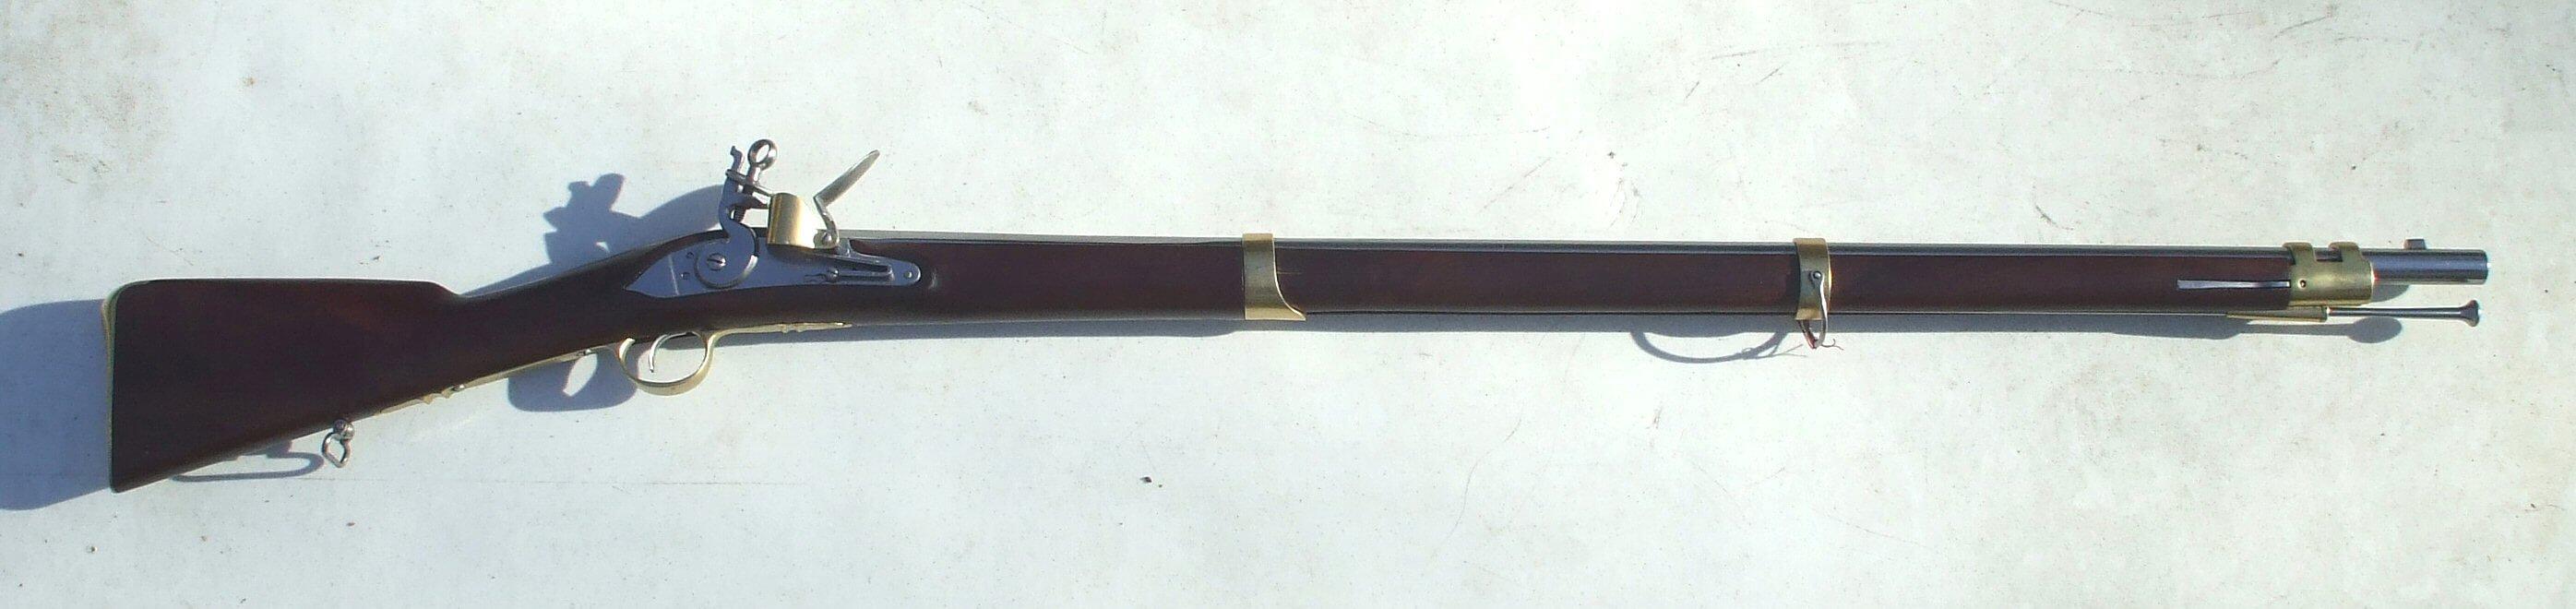 Spanish 1757 Pattern Musket